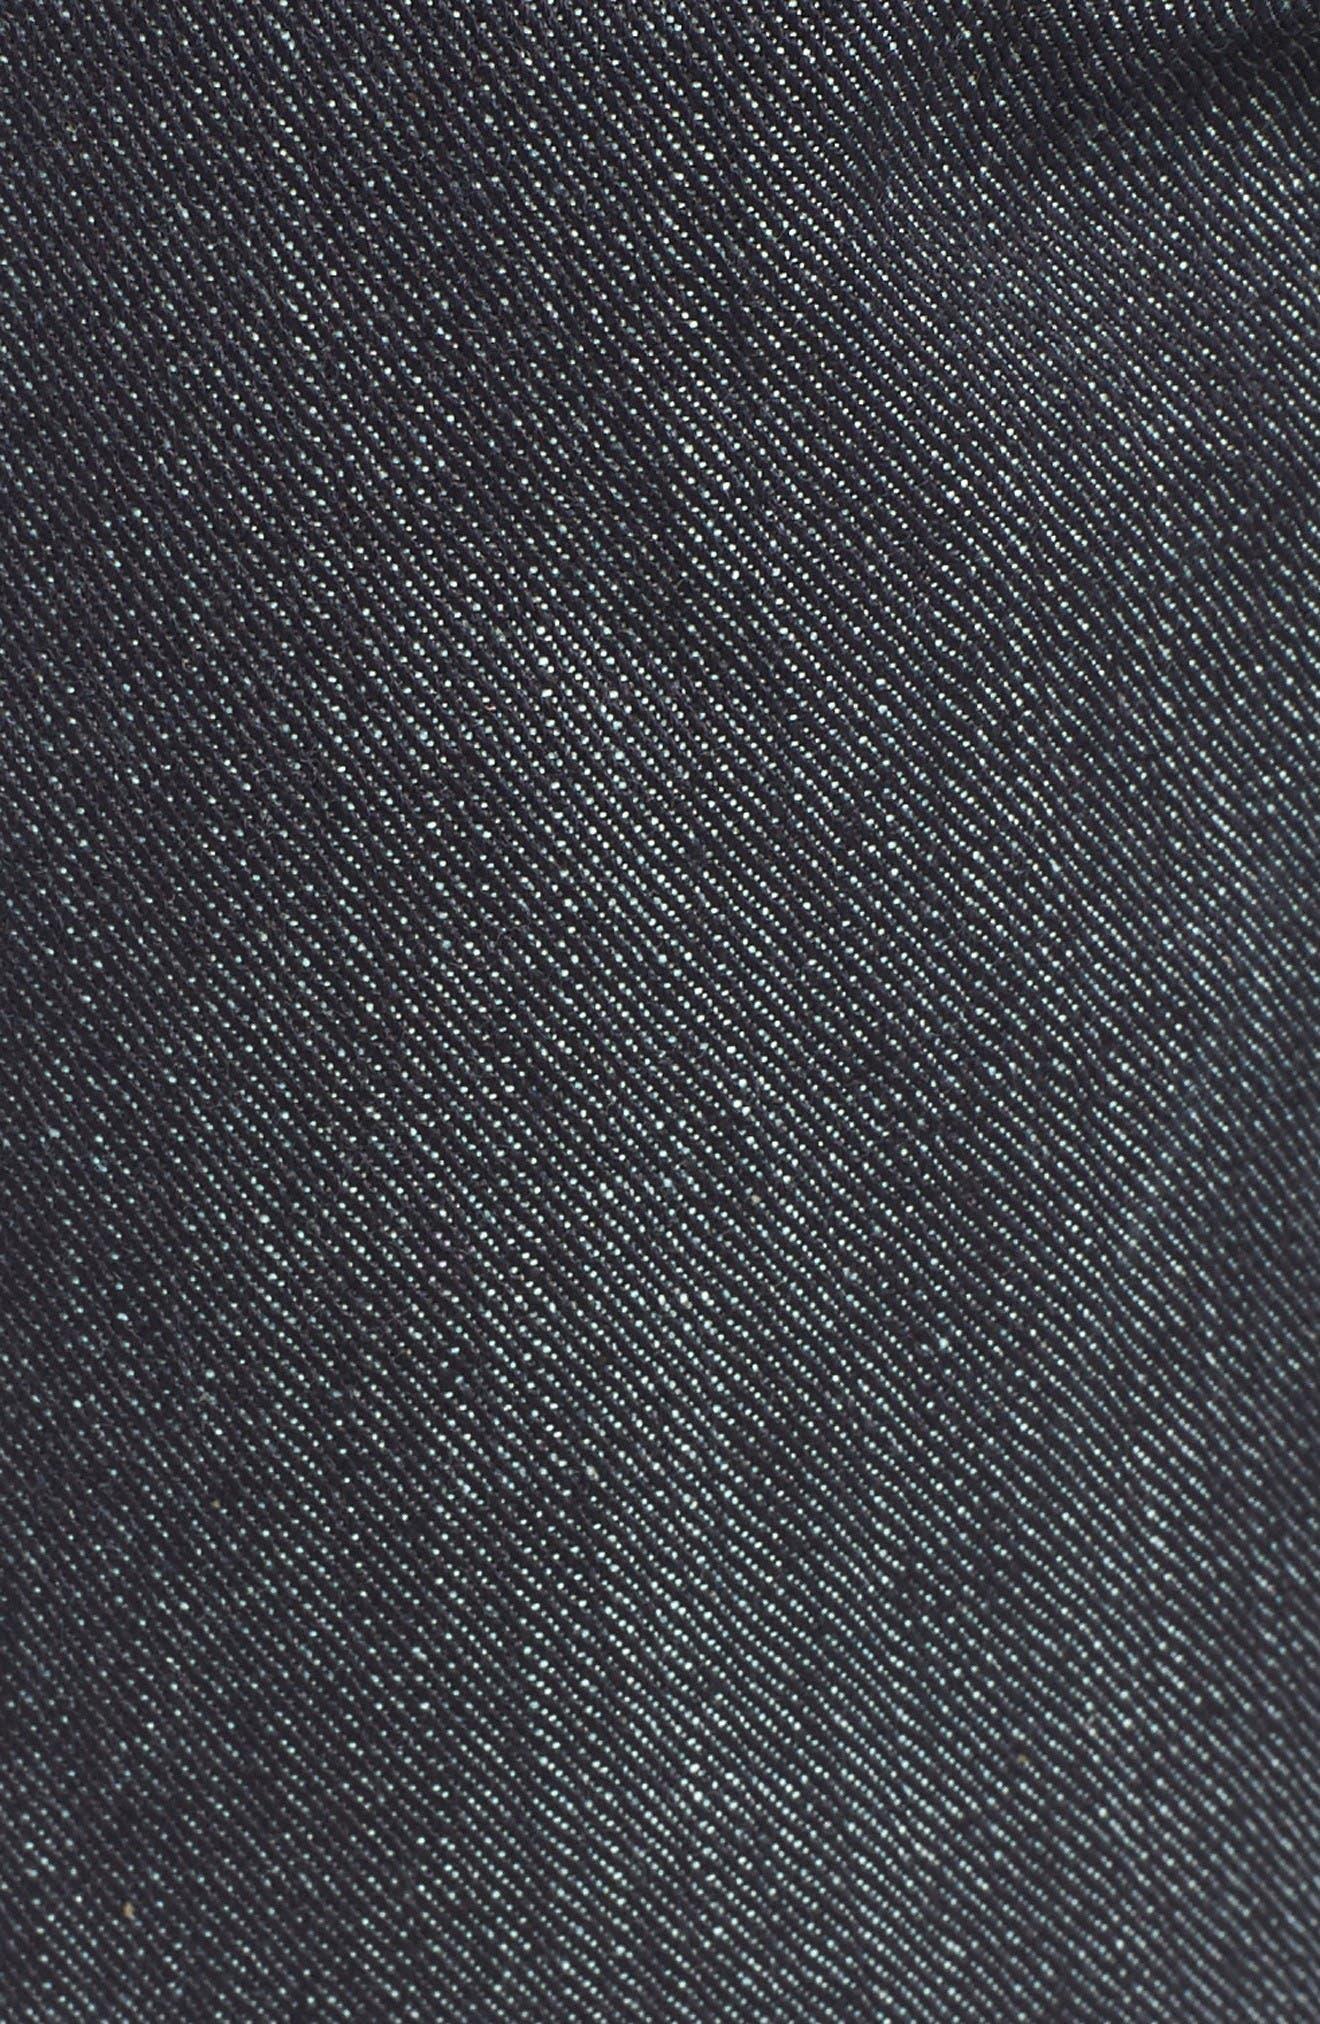 Alternate Image 5  - Naked & Famous Denim Weird Guy Slim Fit Jeans (Left Hand Twill Selvedge)